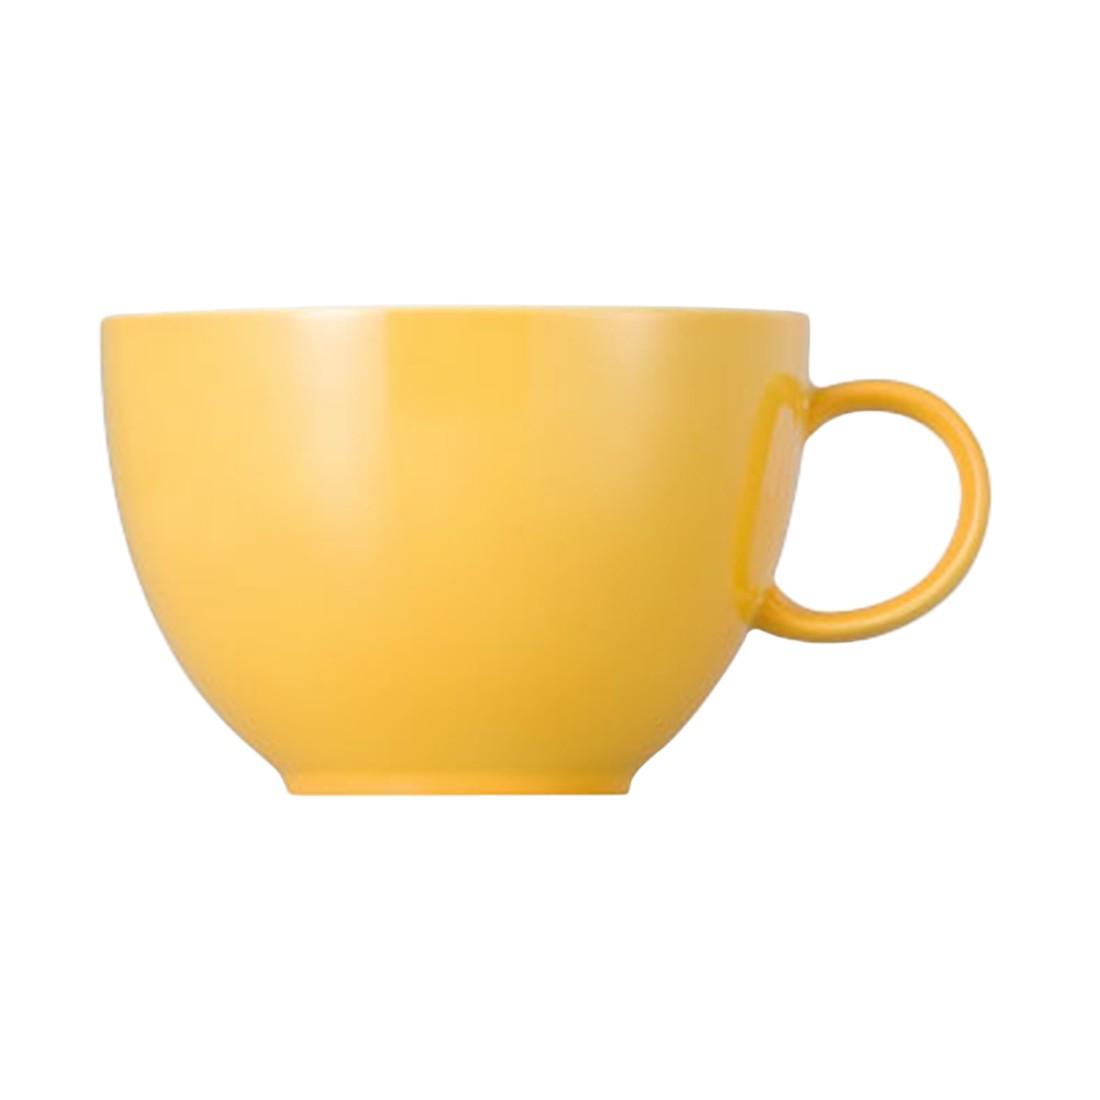 Teetasse Sunny Day – Porzellan Gelb, Thomas günstig kaufen